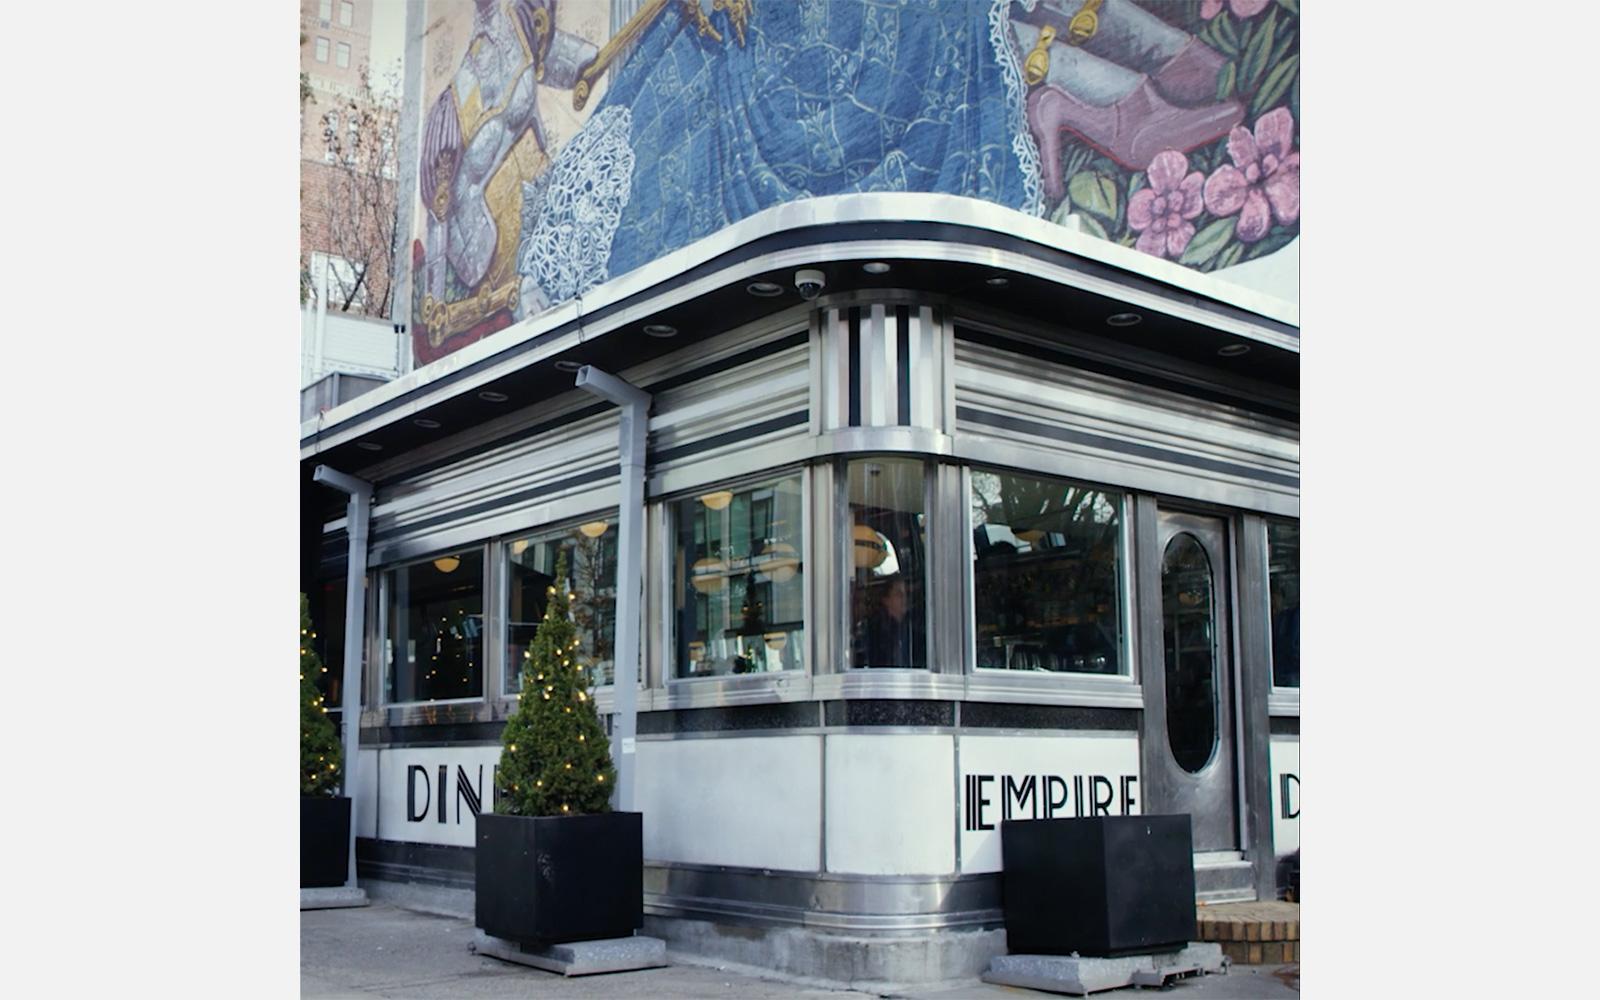 c72bcebee9 Milan Design Week preview: 10 installations not to miss